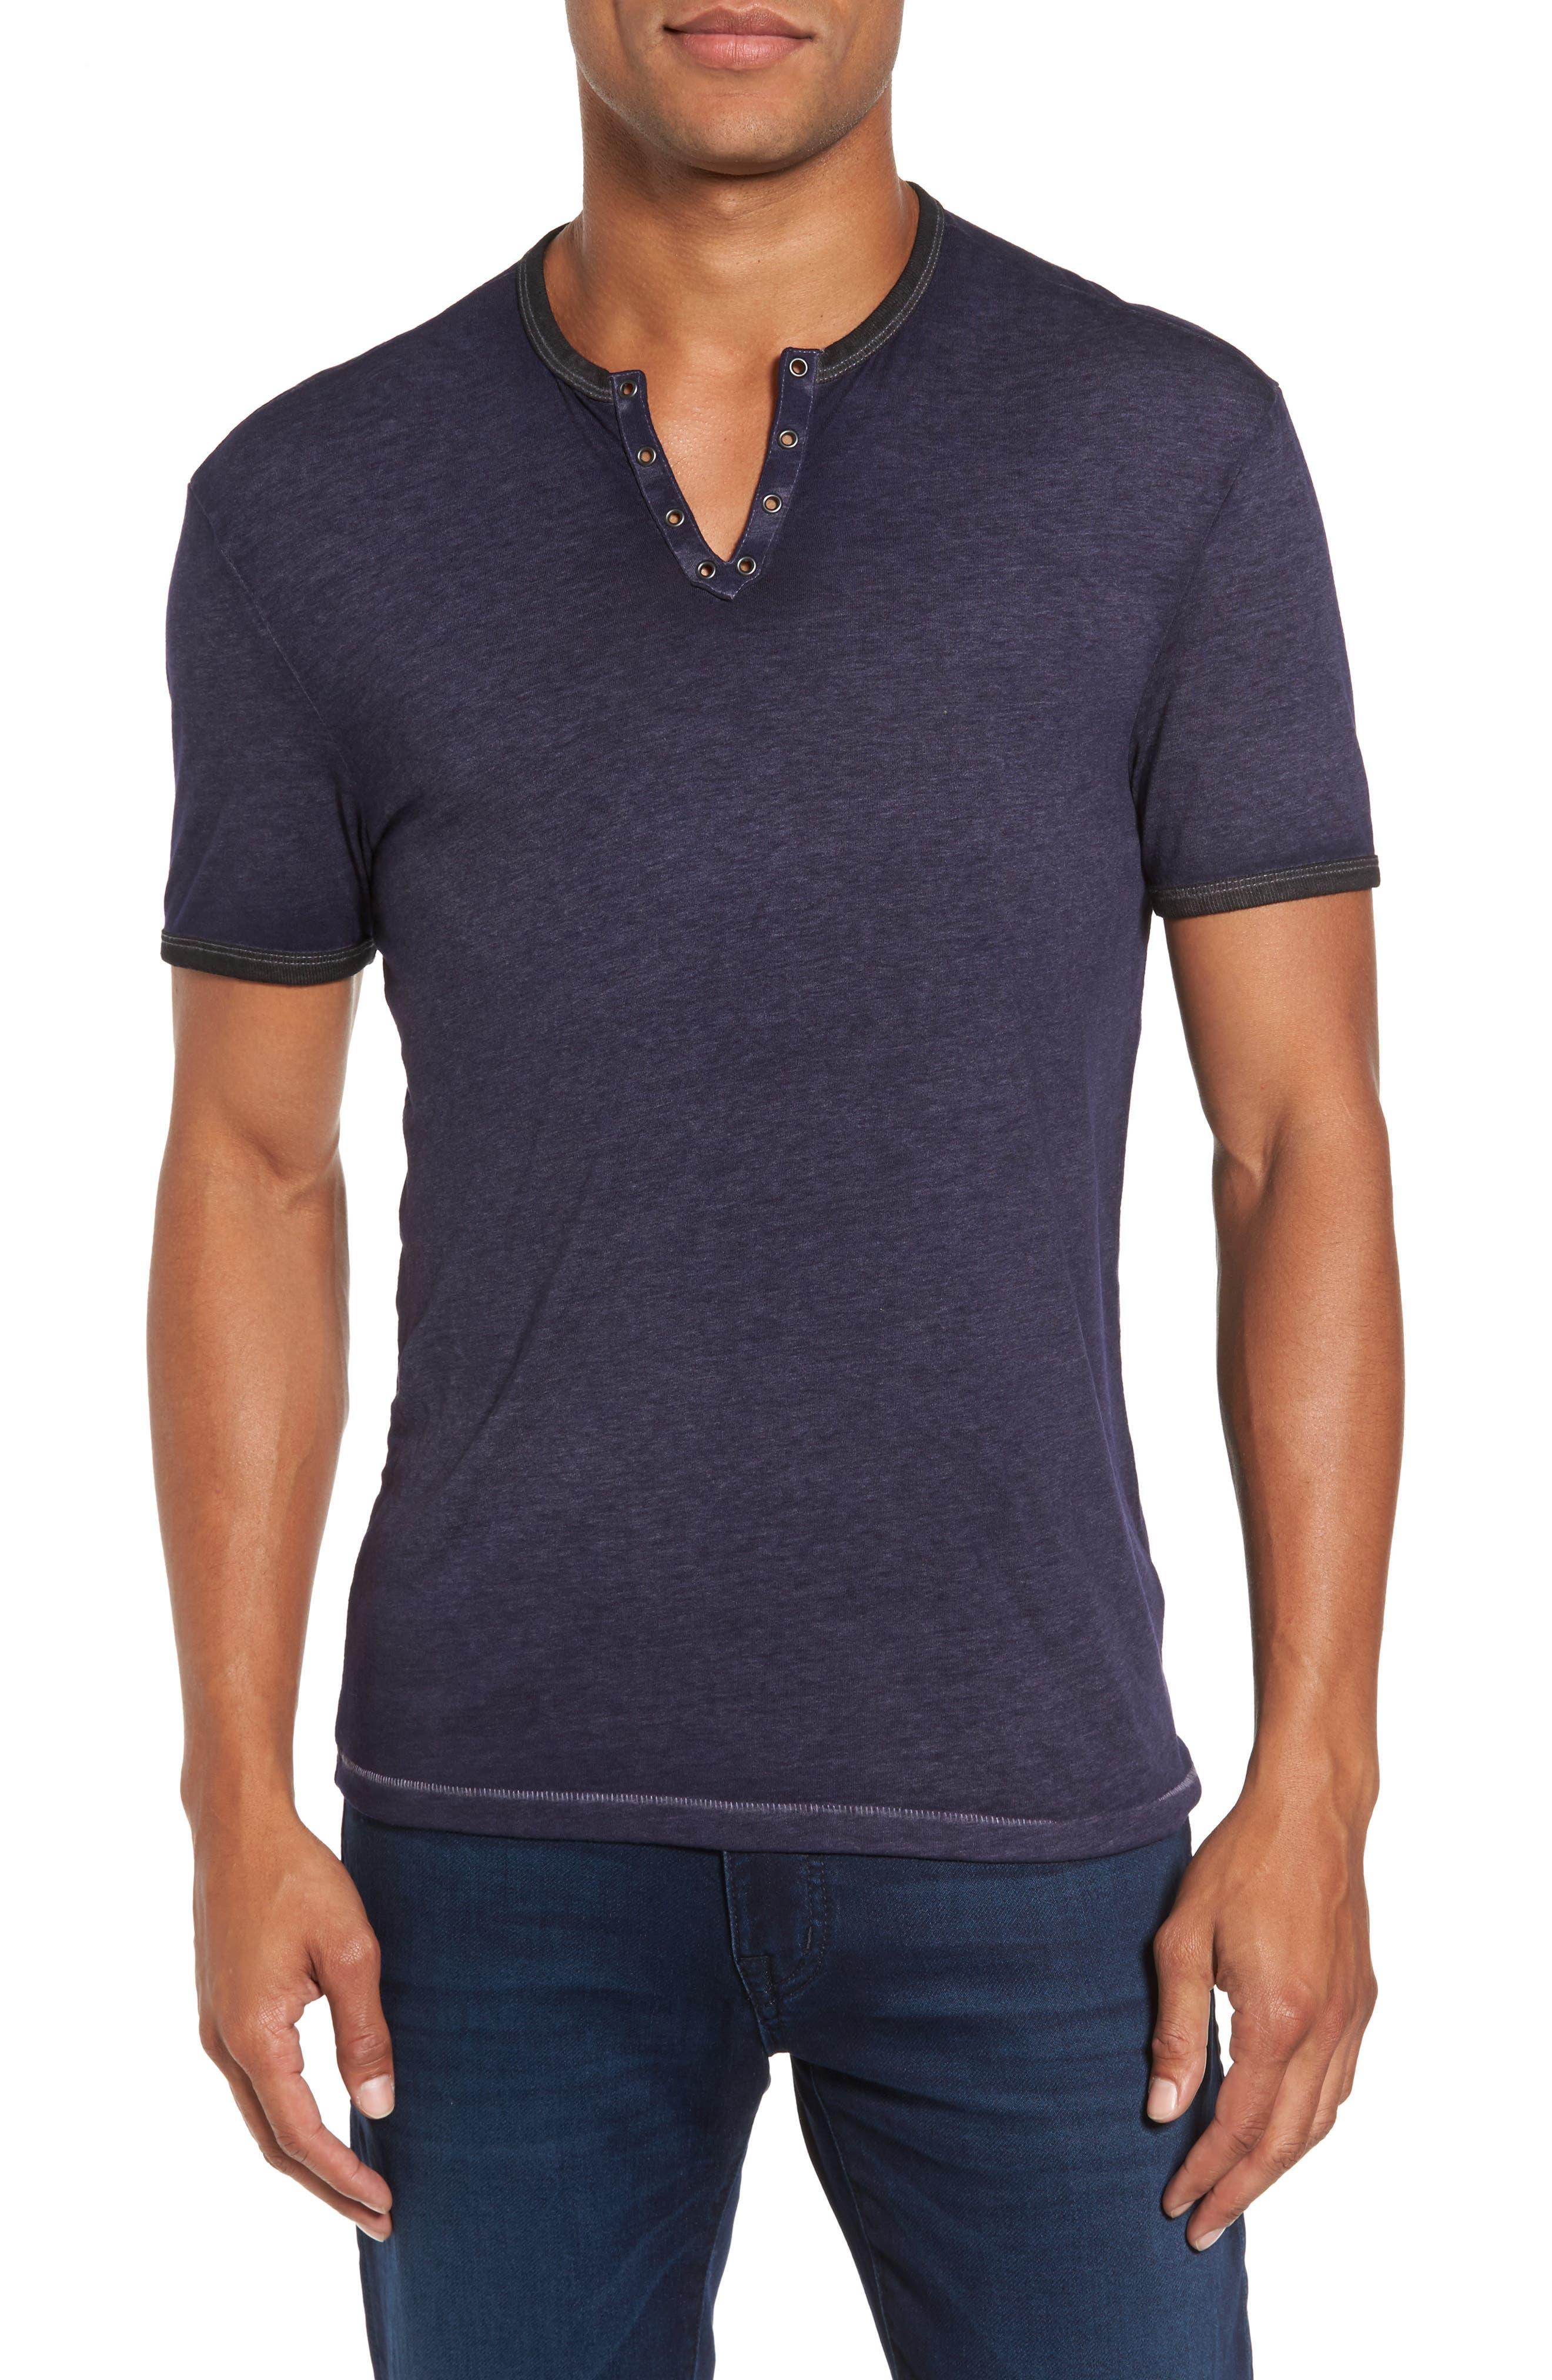 Main Image - John Varvatos Eyelet Henley T-Shirt